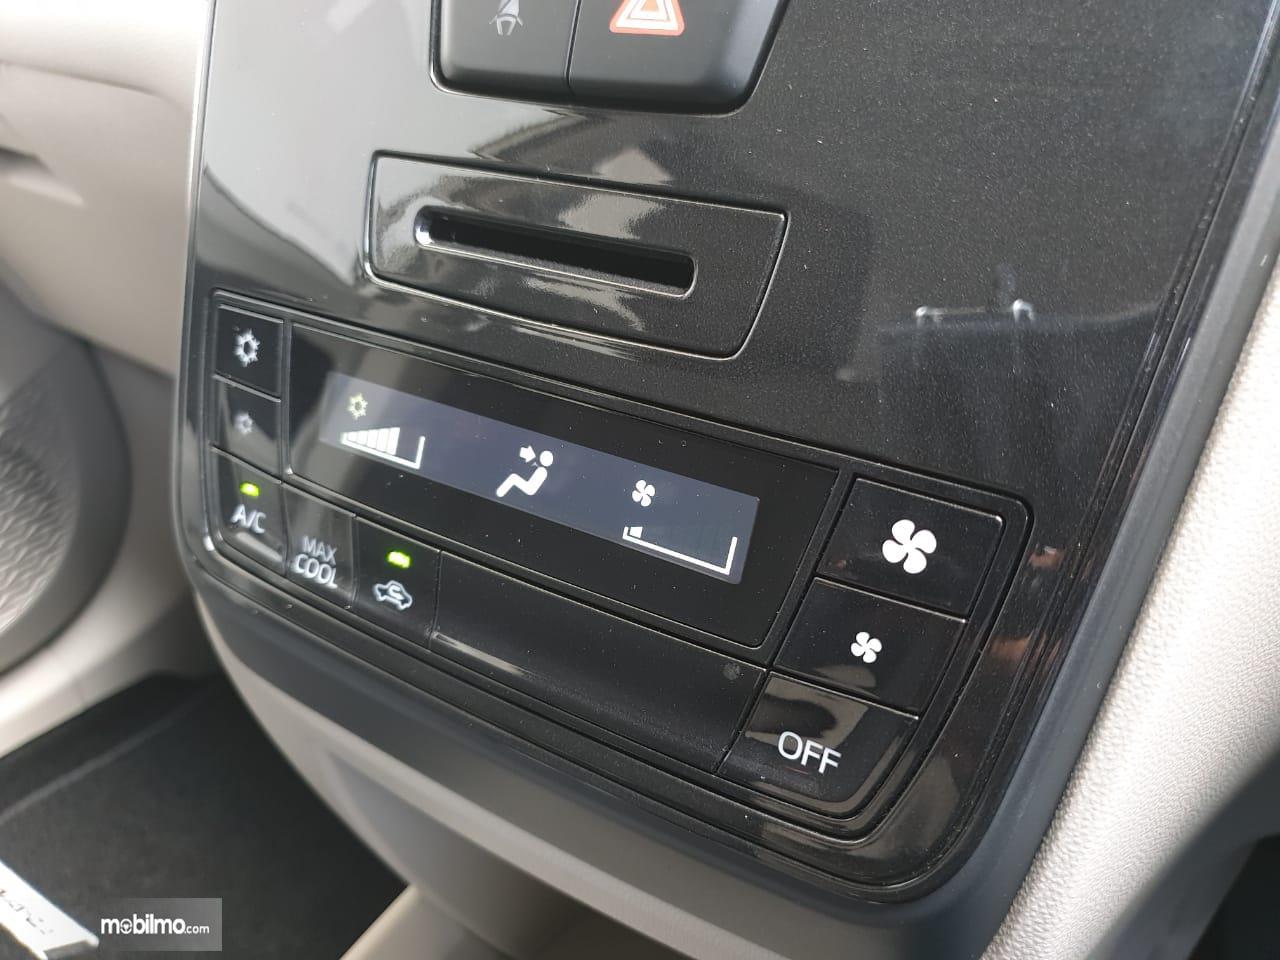 Tampak Pengatur AC digital di New Toyota Avanza 1.5 G M/T 2019